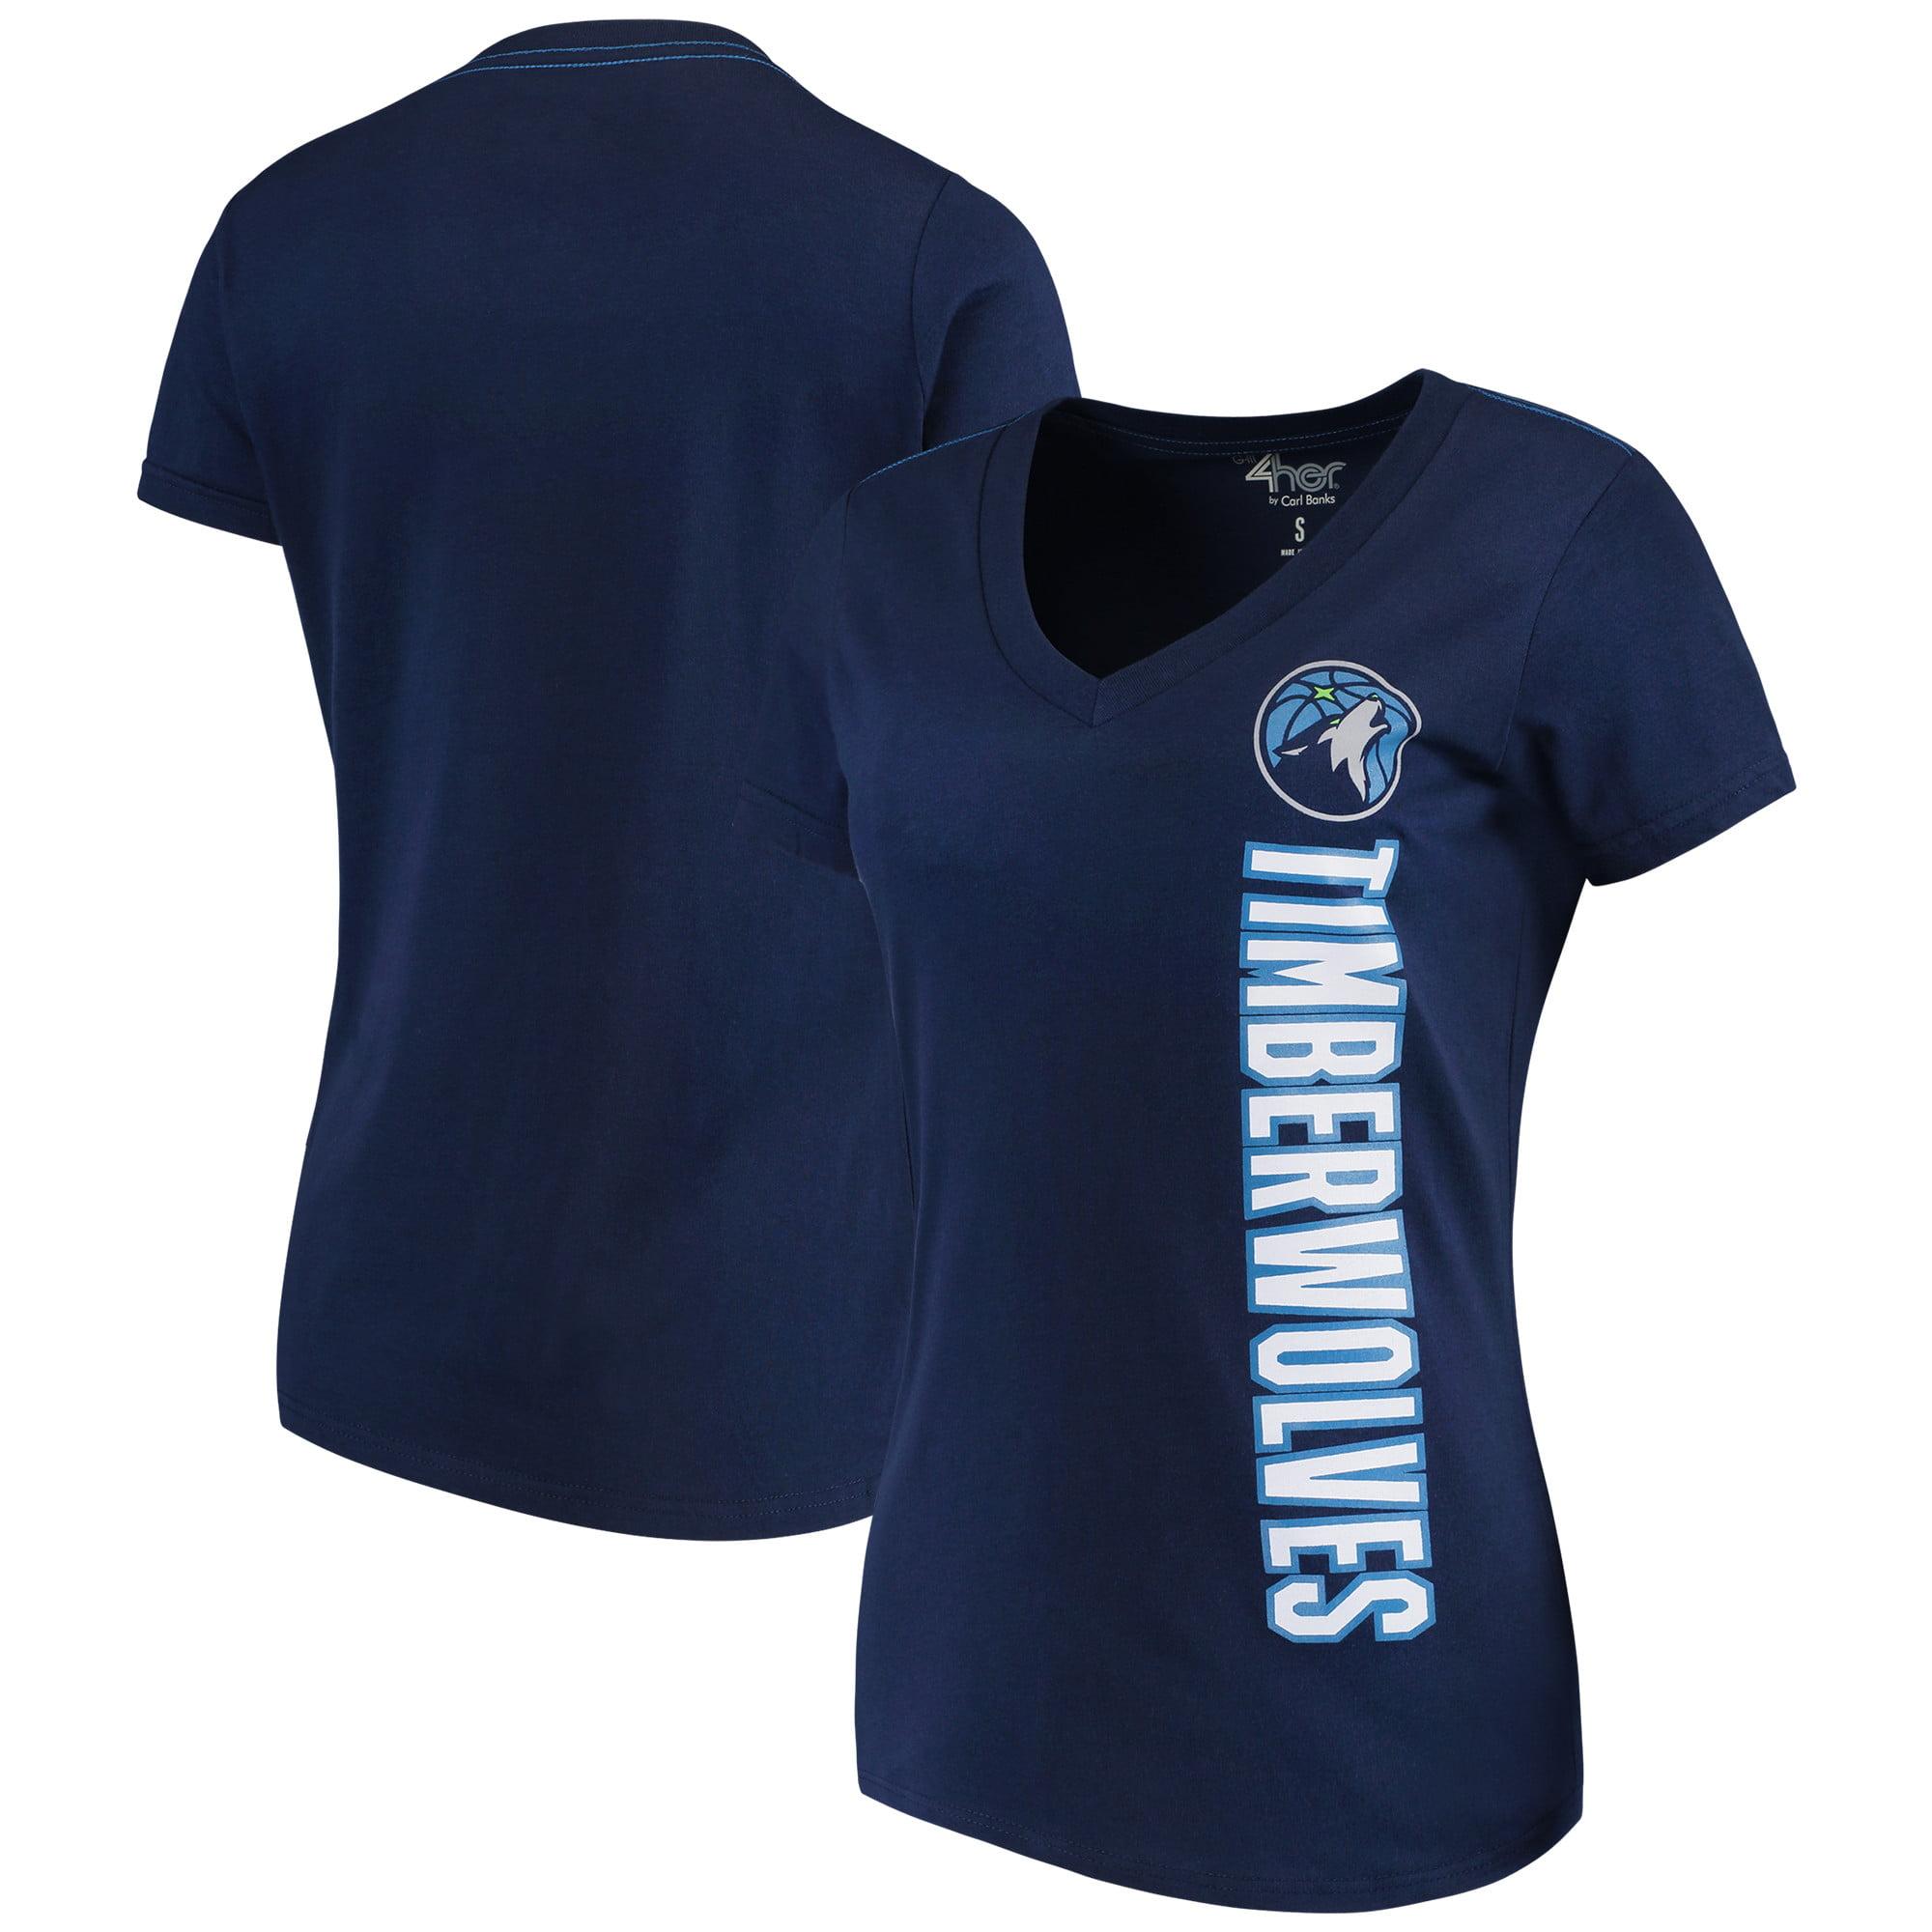 Minnesota Timberwolves G-III 4Her by Carl Banks Women's Asterisk V-Neck T-Shirt - Navy